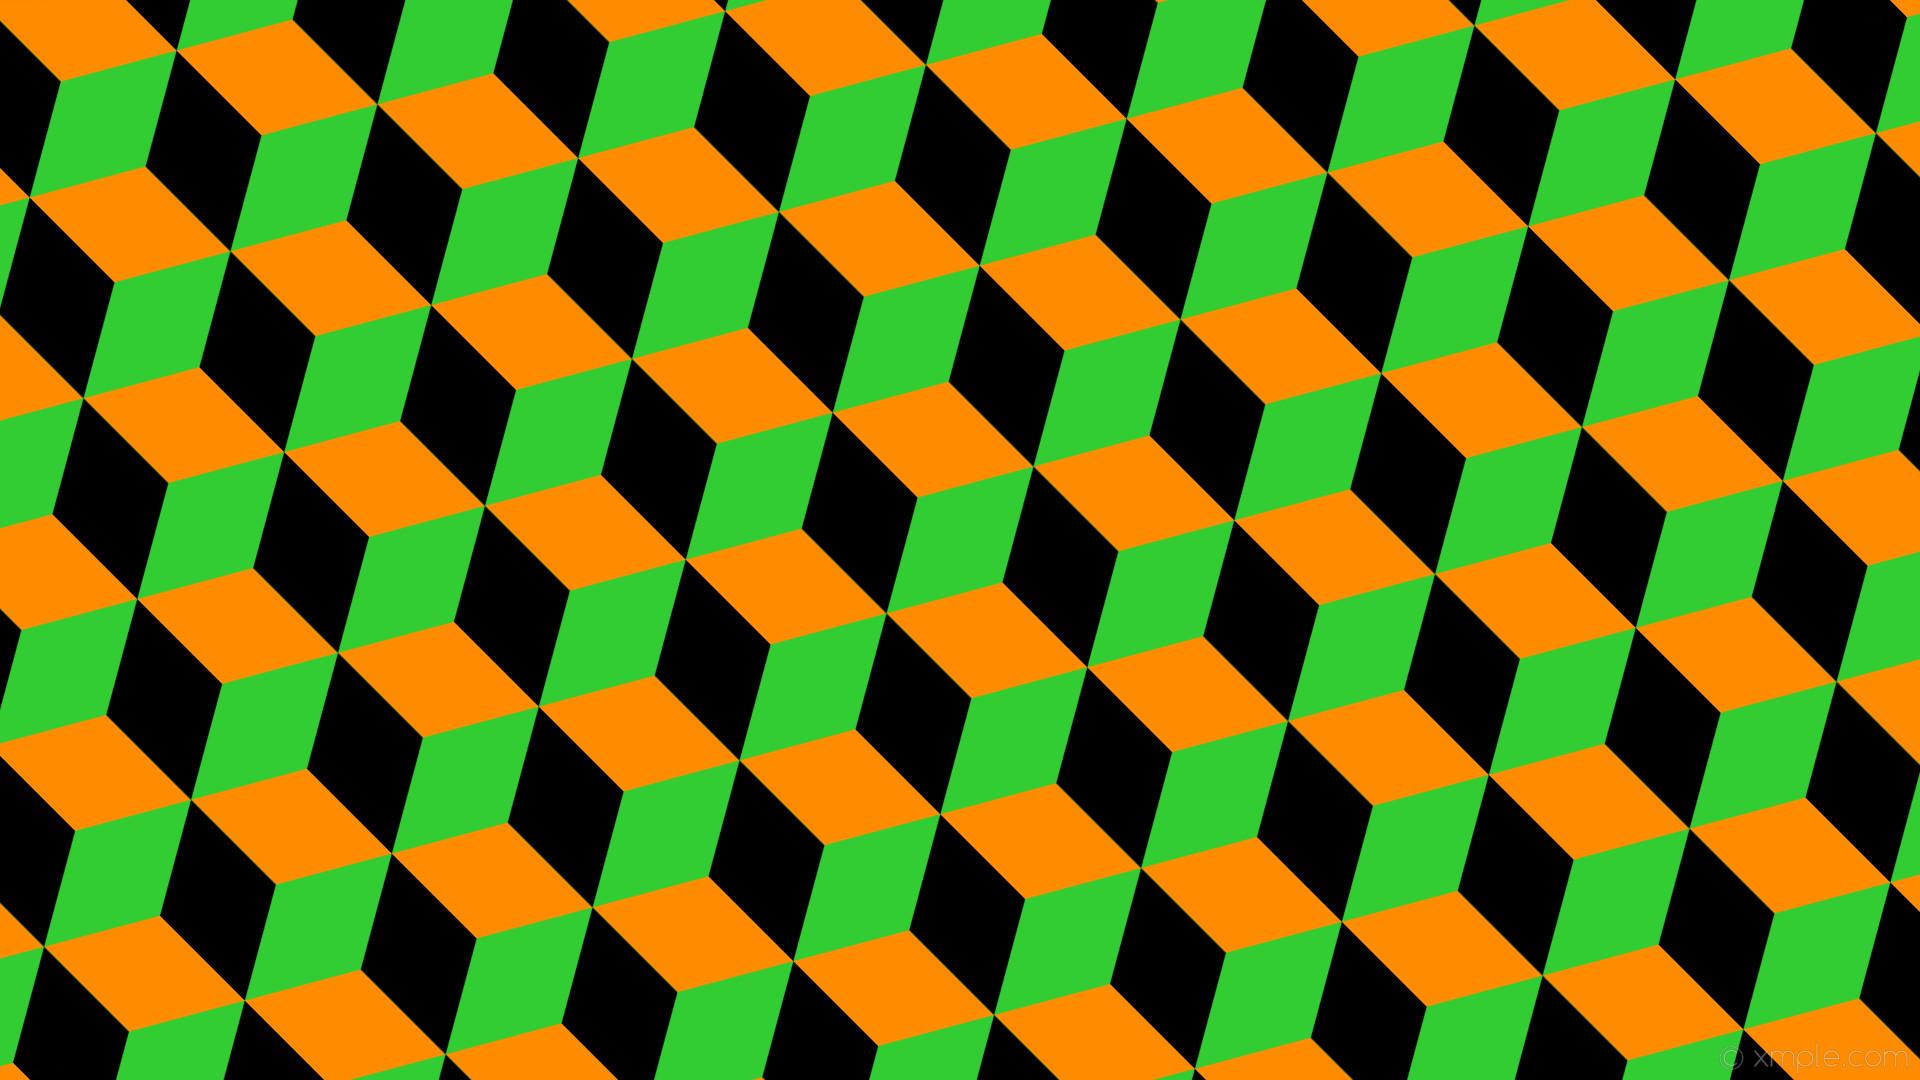 wallpaper green black orange 3d cubes lime green dark orange #32cd32  #ff8c00 #000000